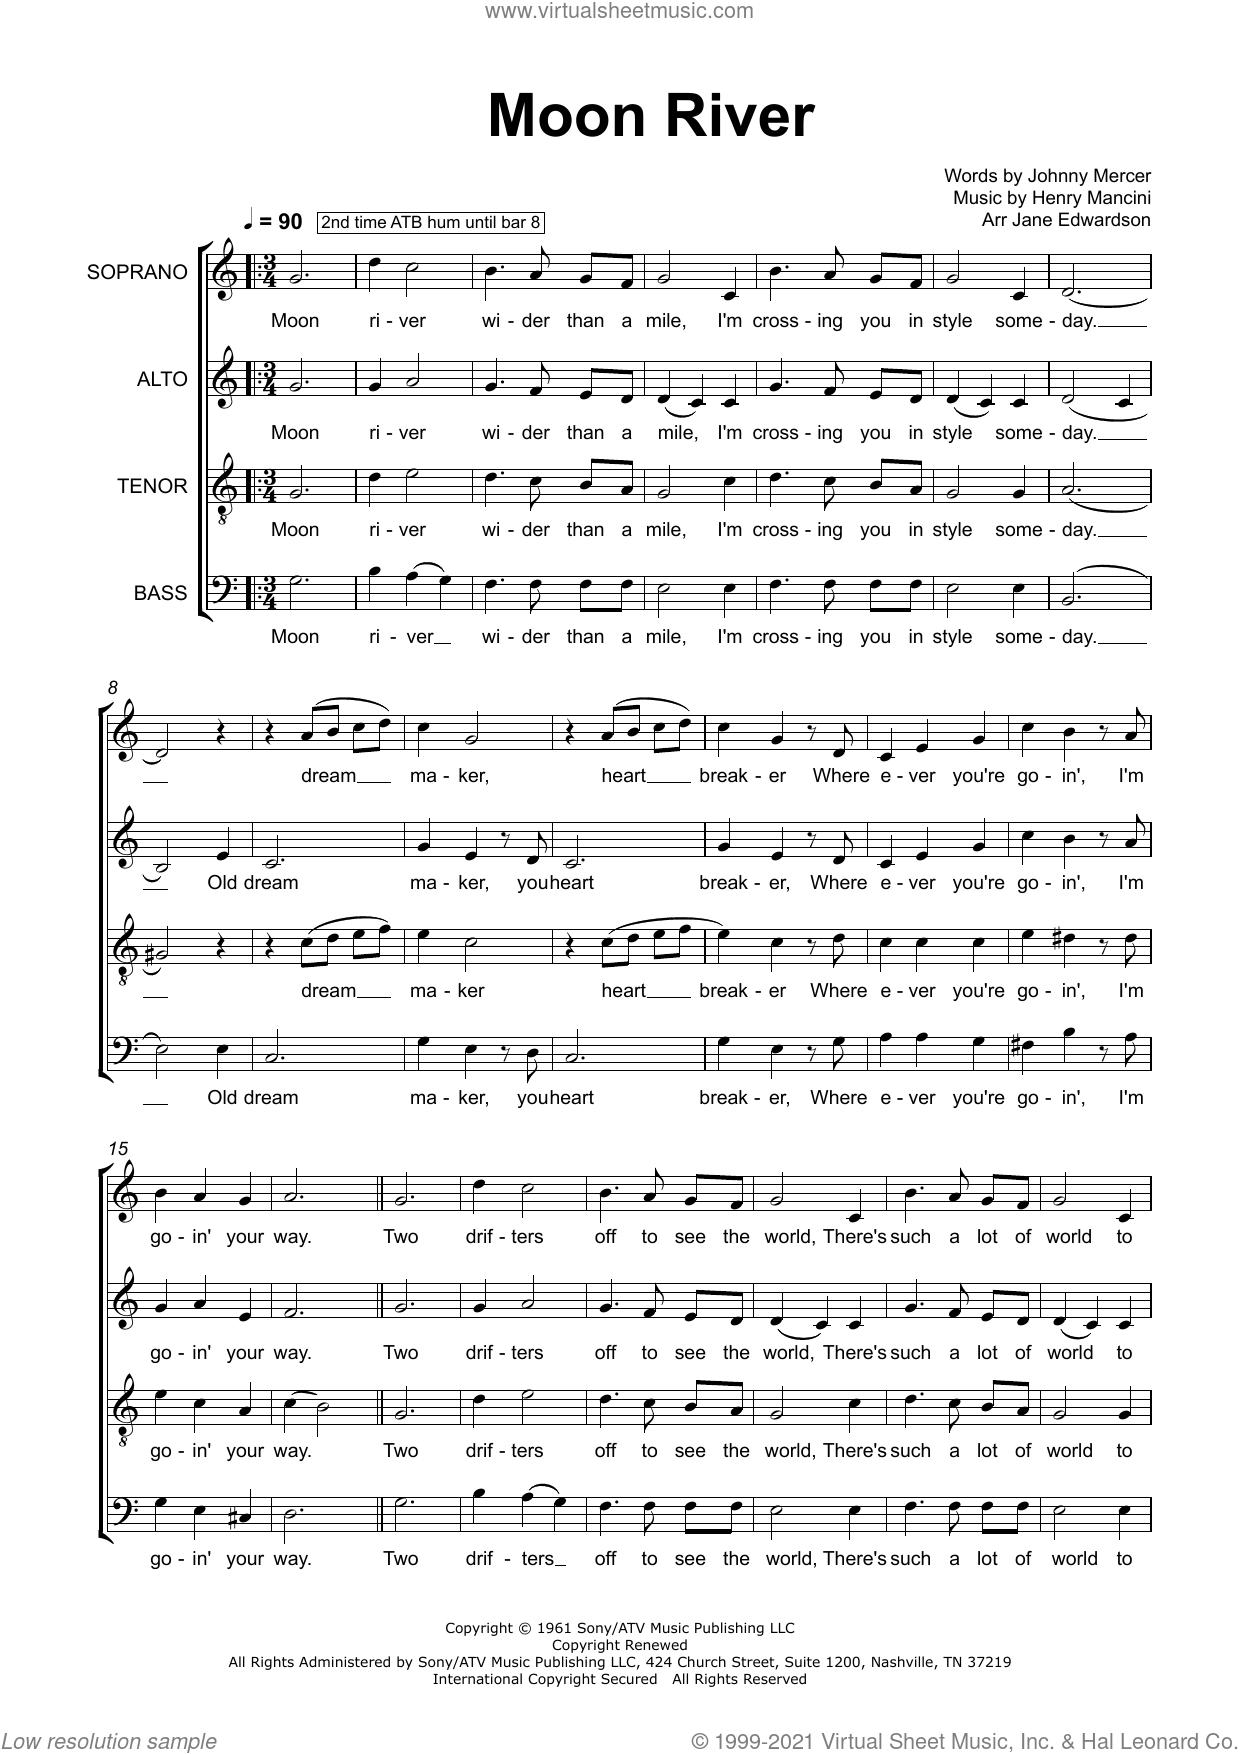 Moon River (arr. Jane Edwardson) sheet music for choir (SATB: soprano, alto, tenor, bass) by Henry Mancini, Jane Edwardson and Johnny Mercer, intermediate skill level